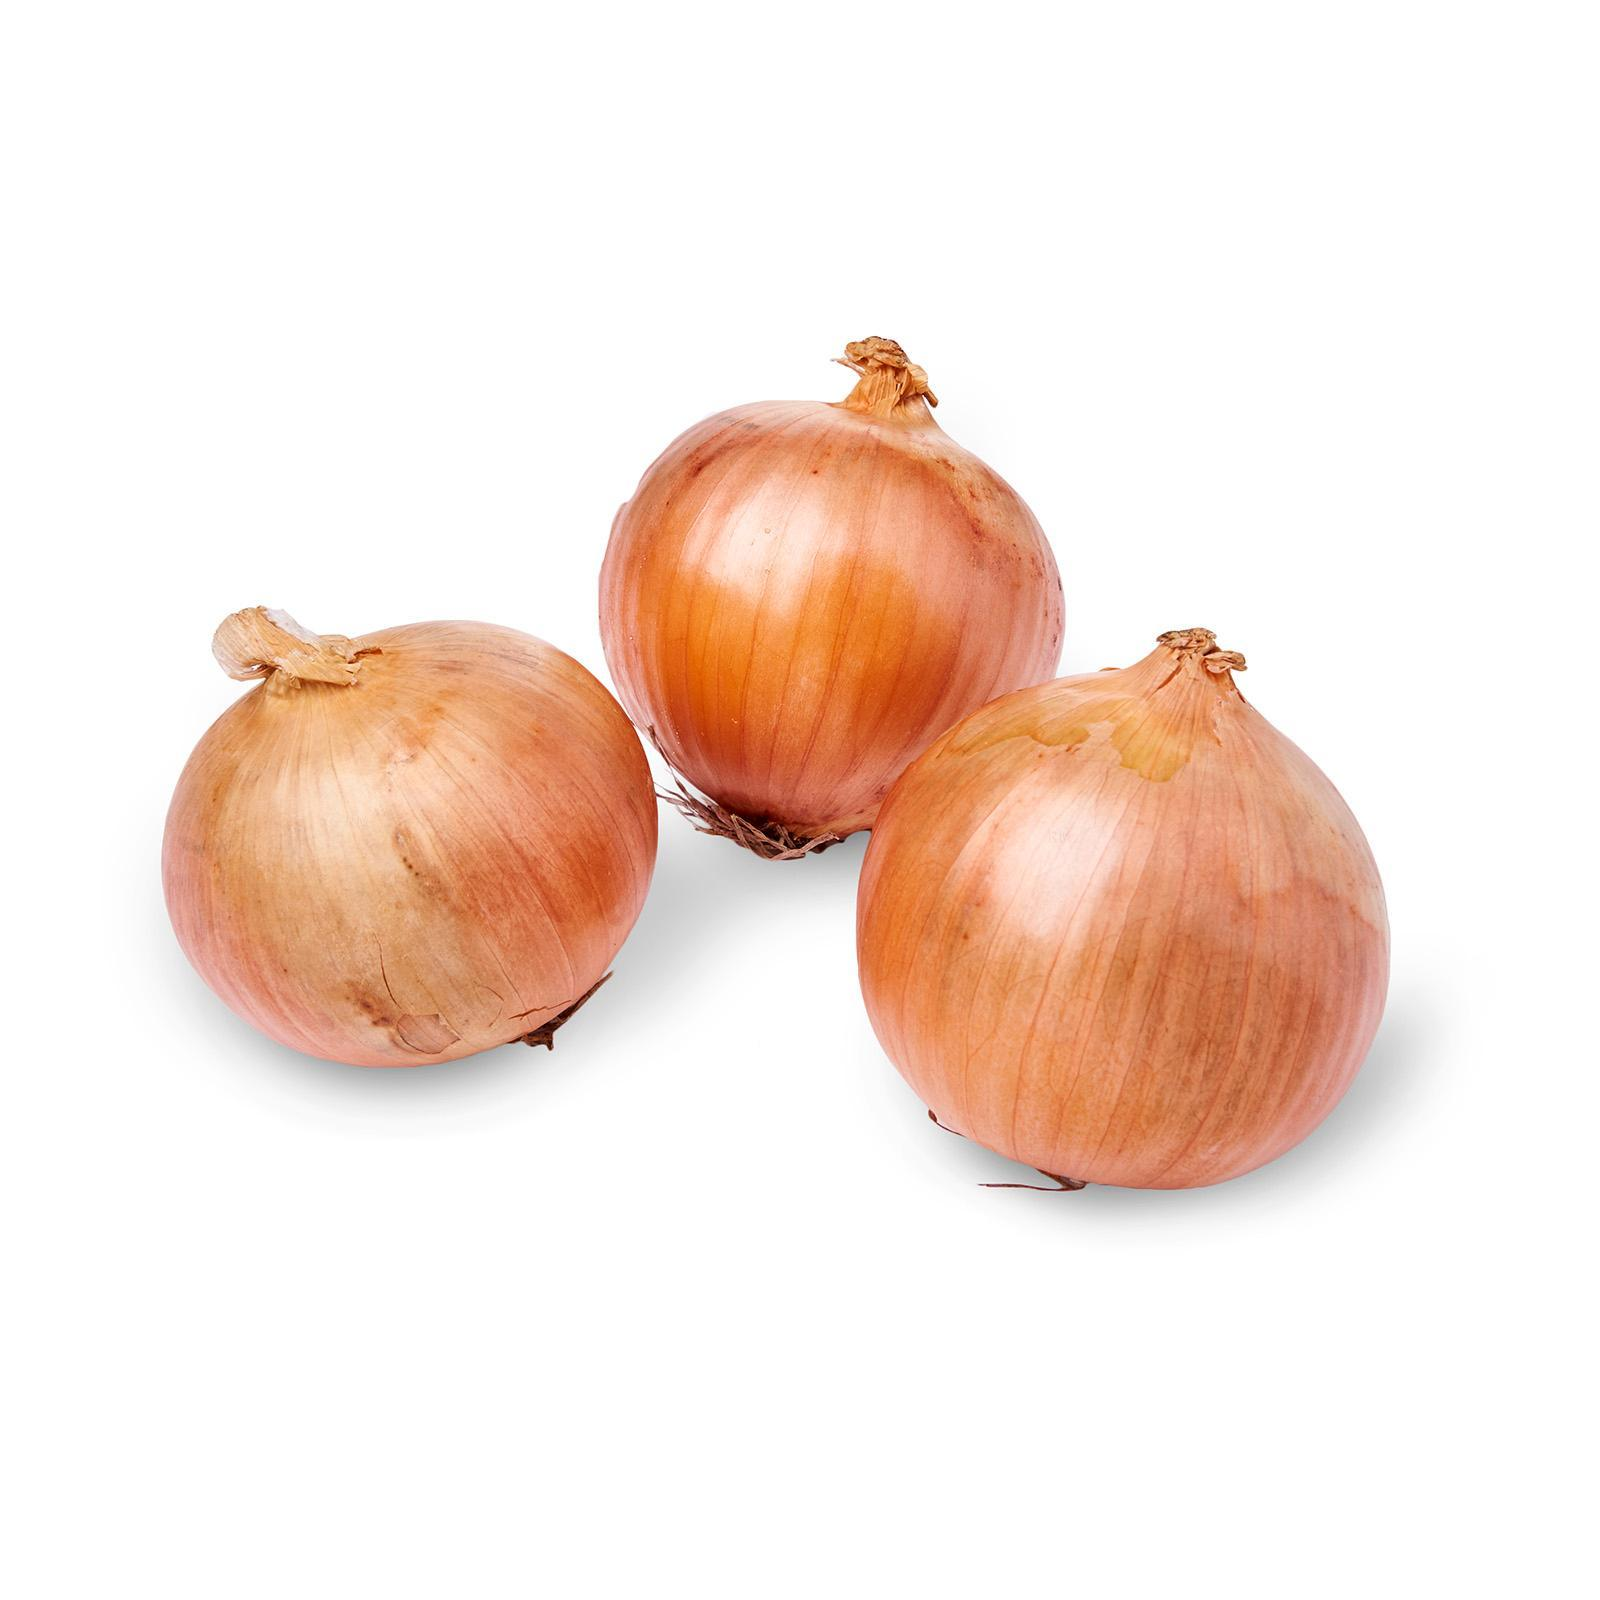 Kirei Hokkaido Tamanegi Japan Fresh Onion 3 PCS